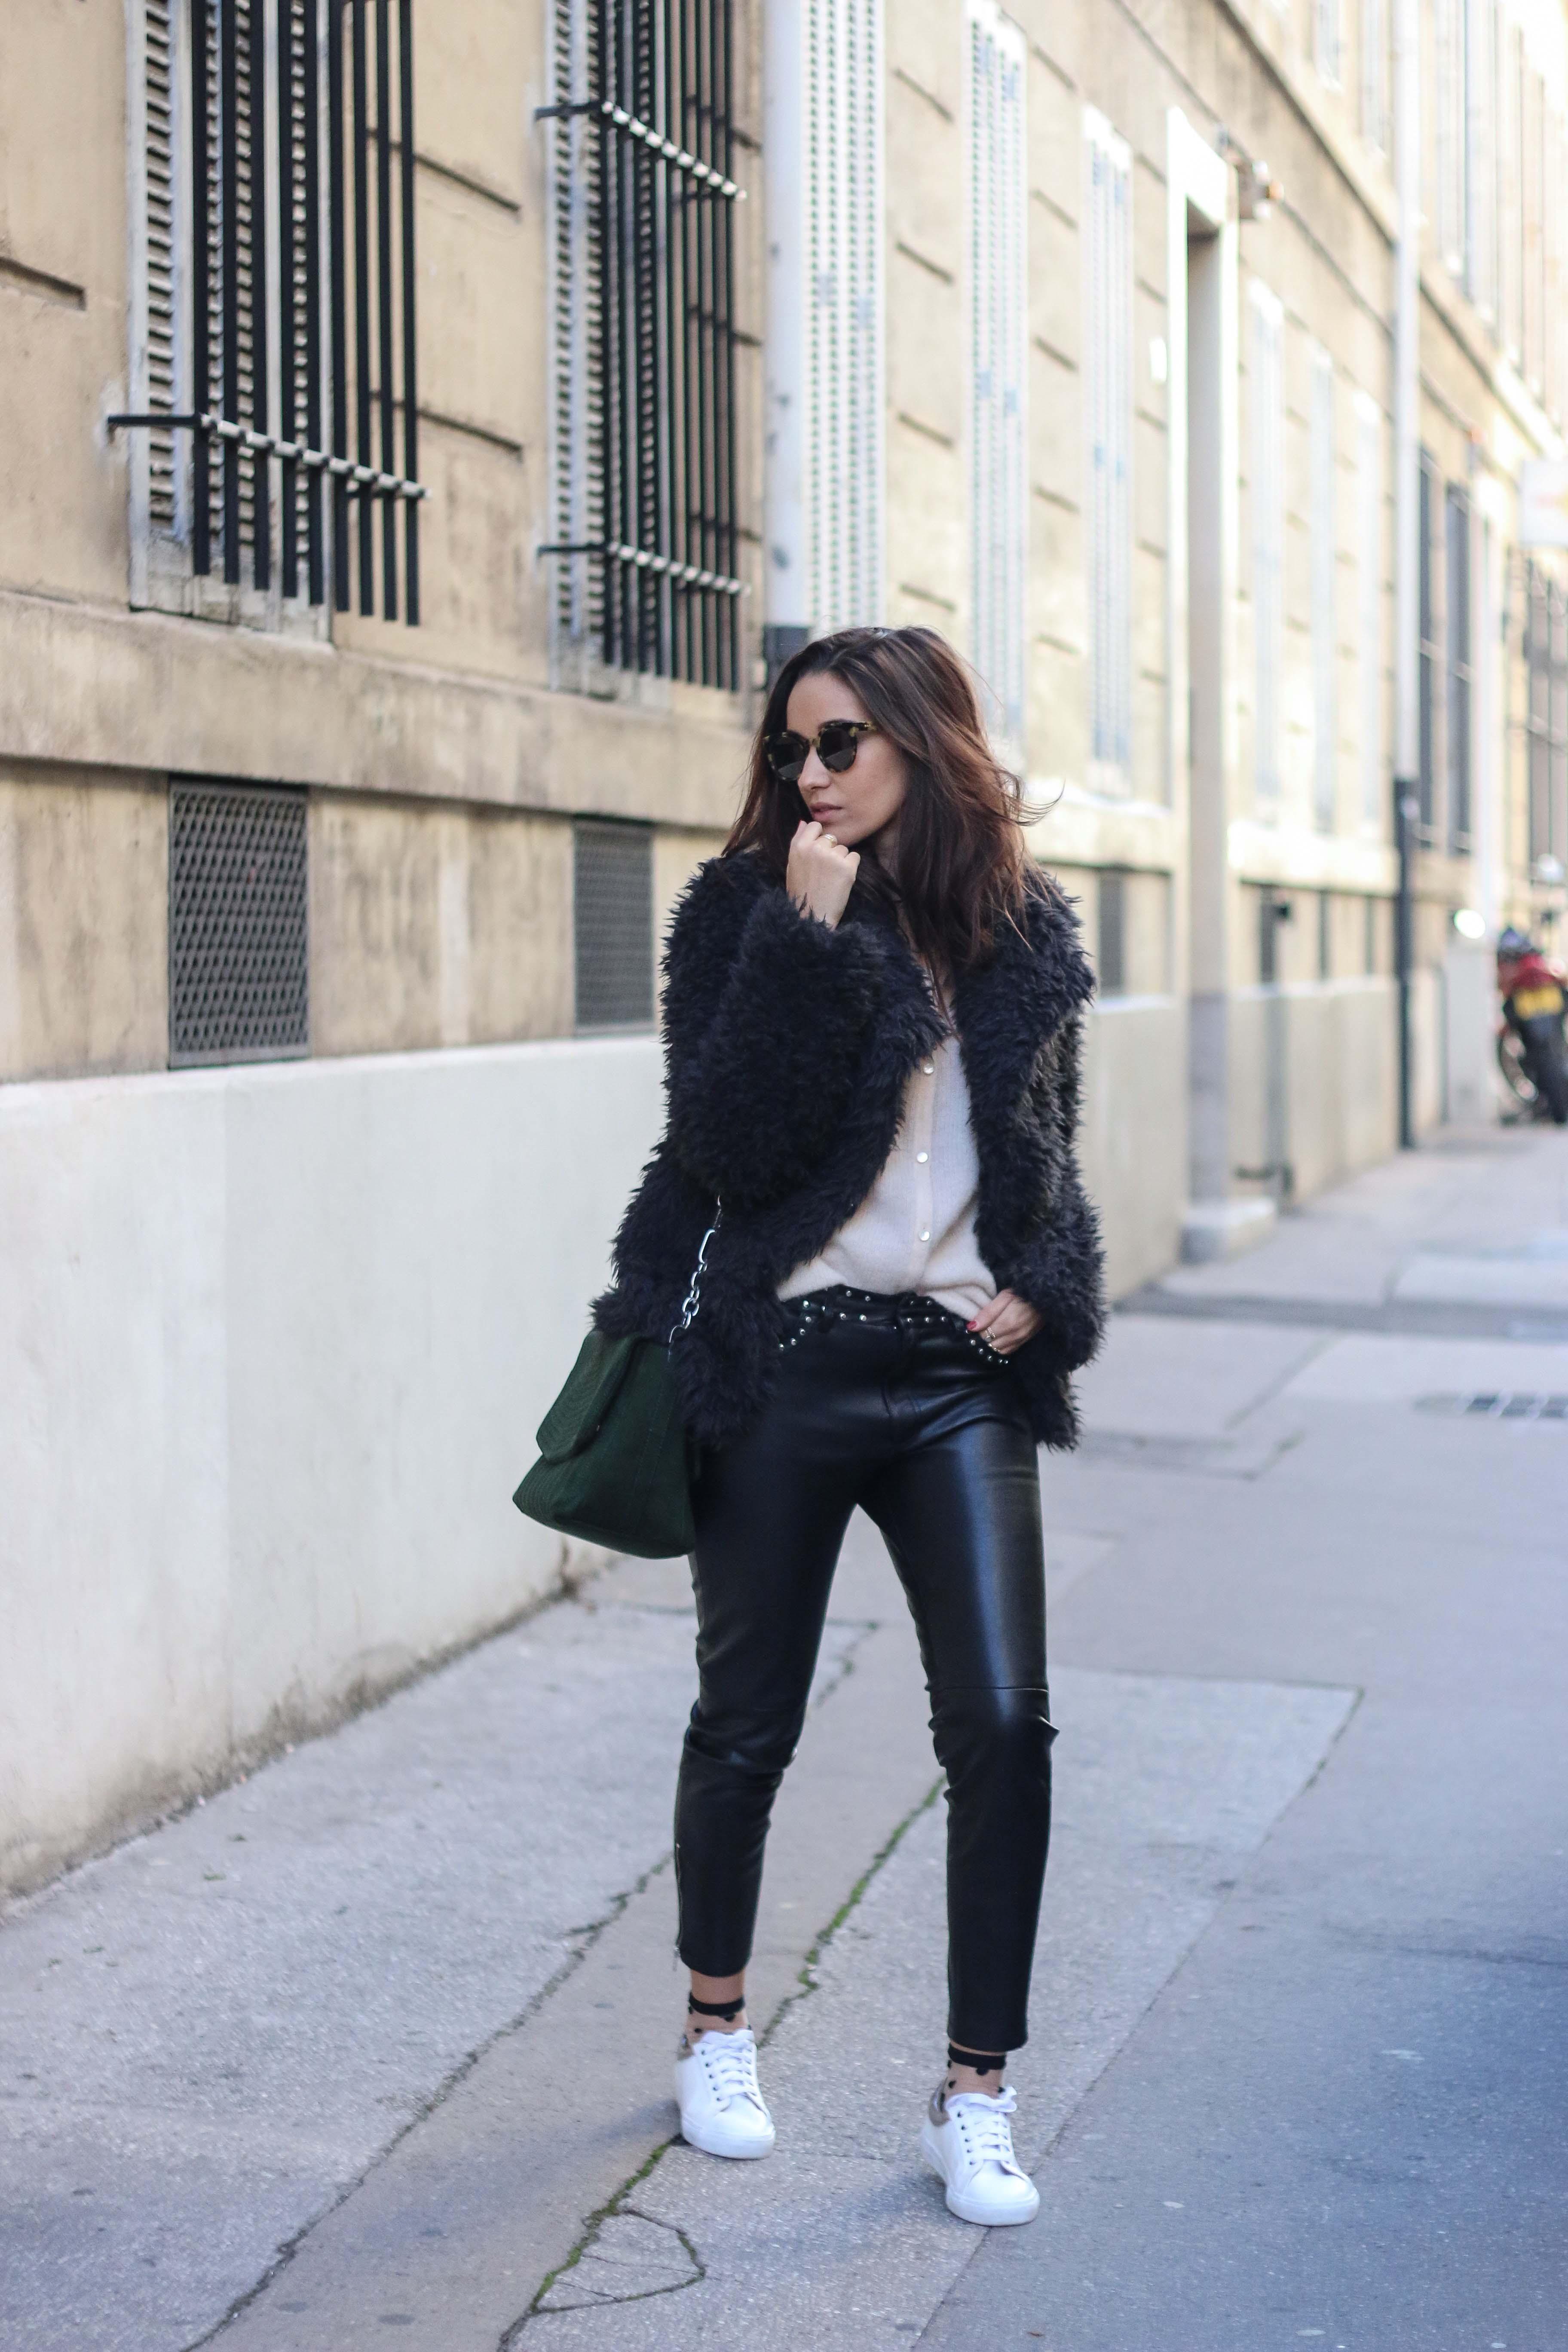 blog-mode-idee-look-manteau-fourrure